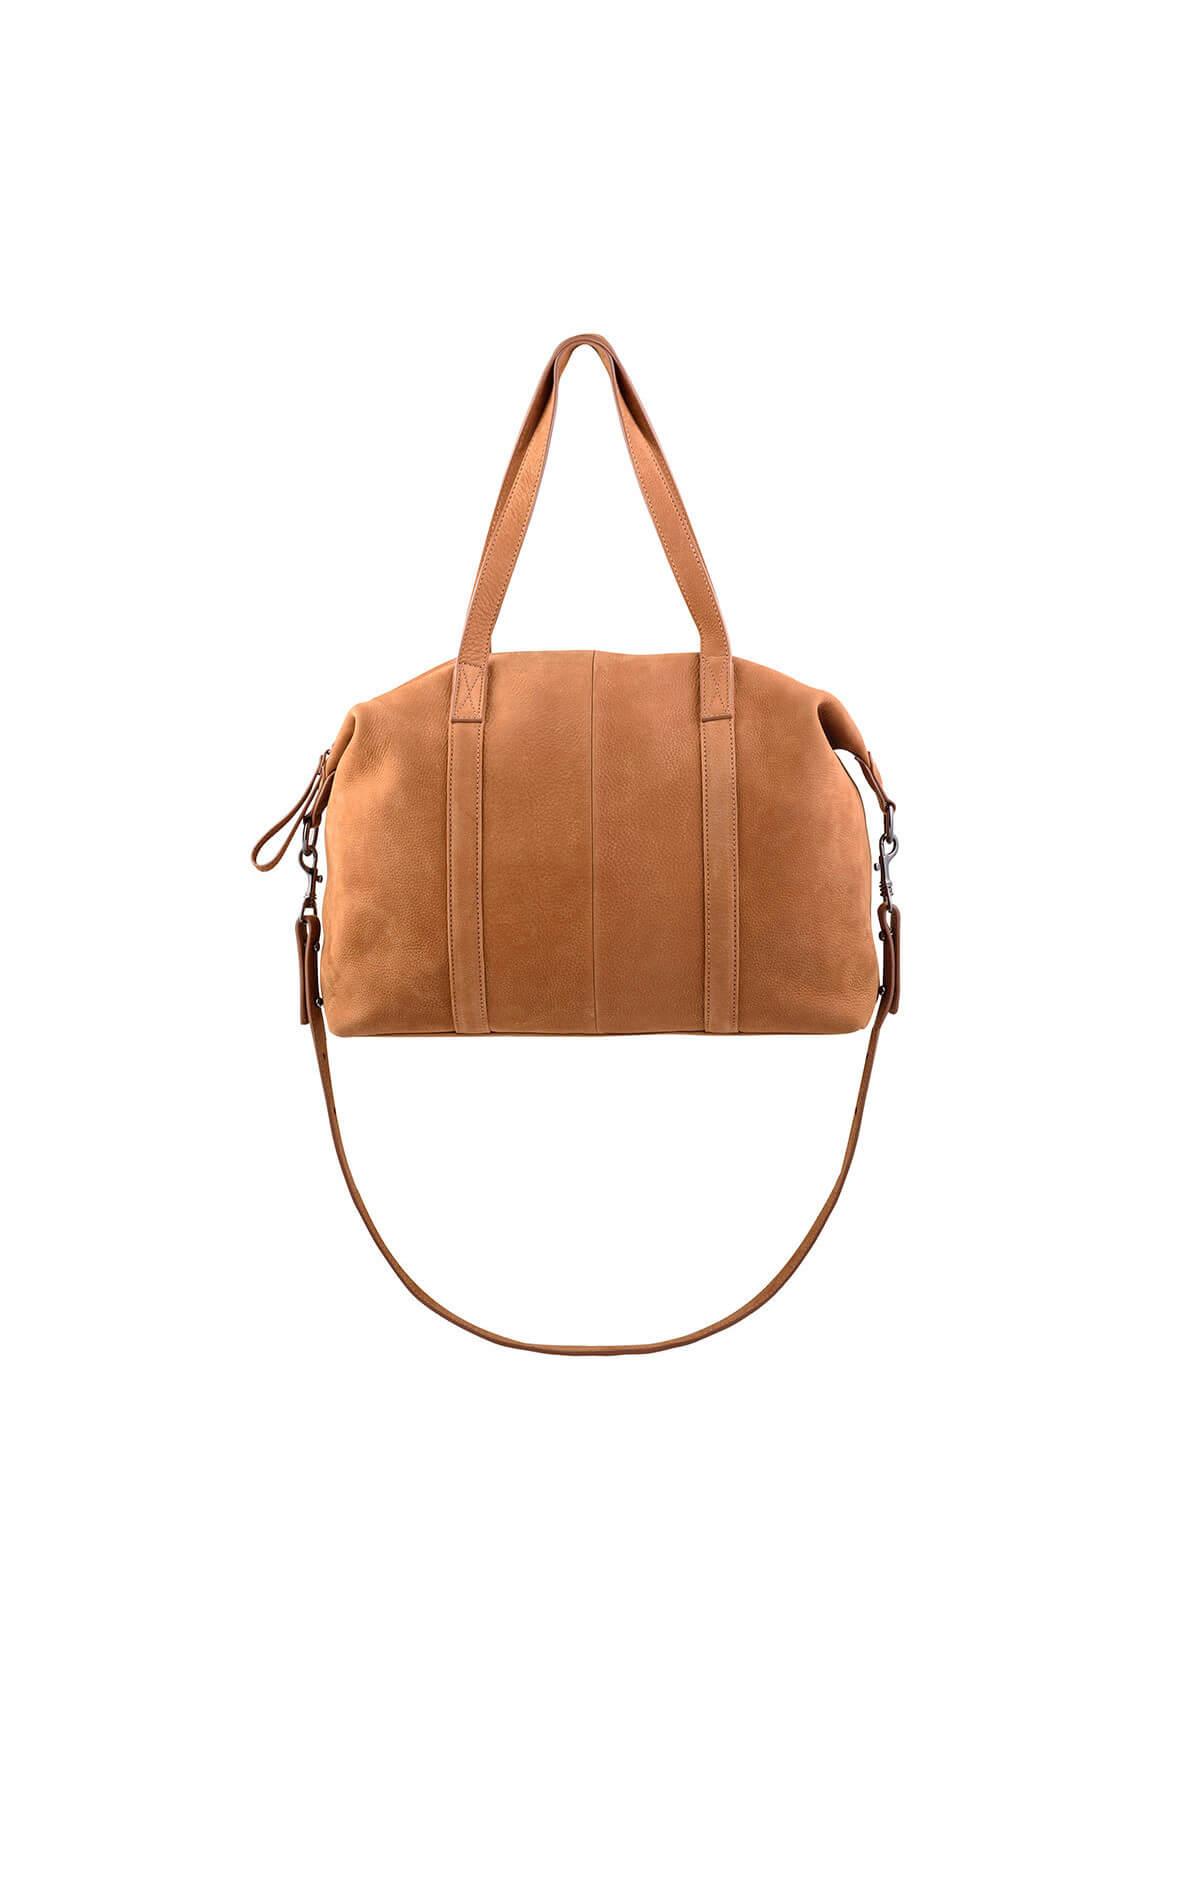 status anxiety fall of hearts leather handbag tan